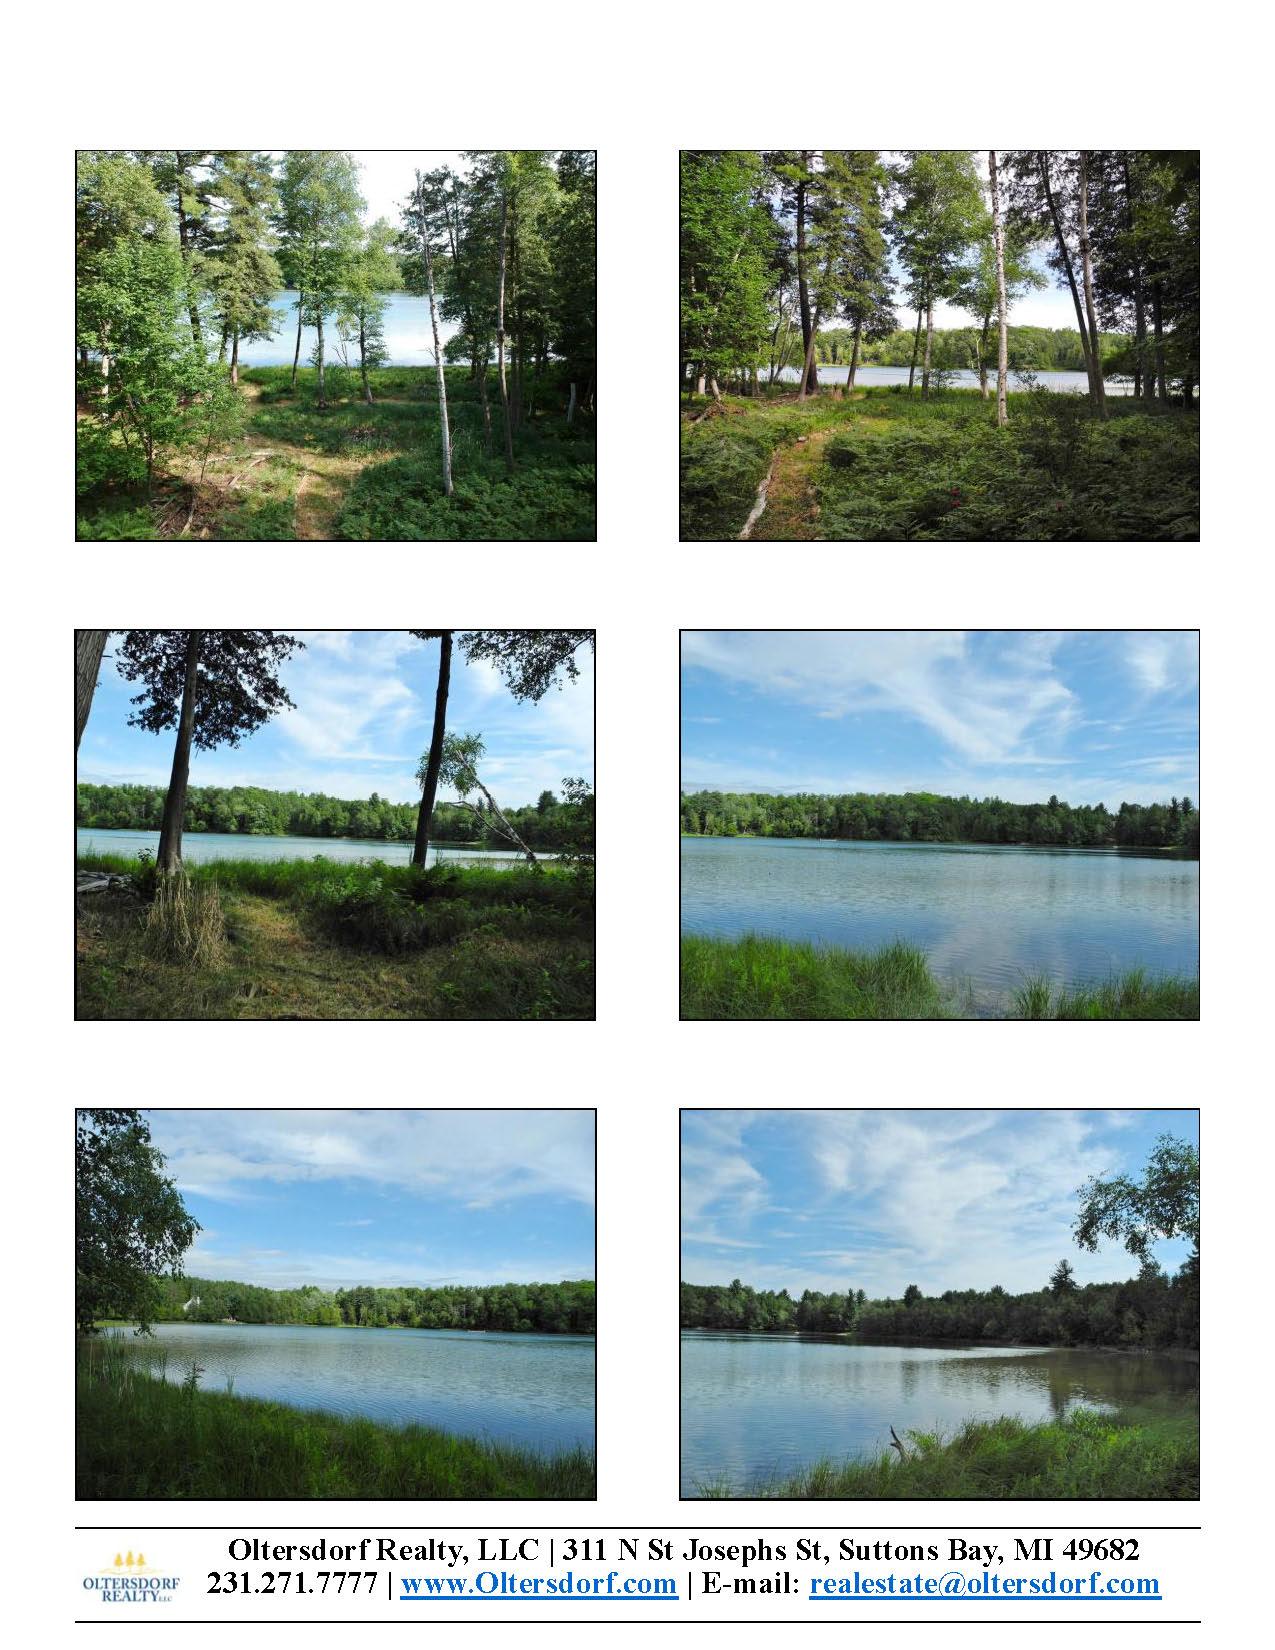 4936 Truax Lake Road, Williamsburg Marketing - For Sale by Oltersdorf Realty LLC (2).jpg